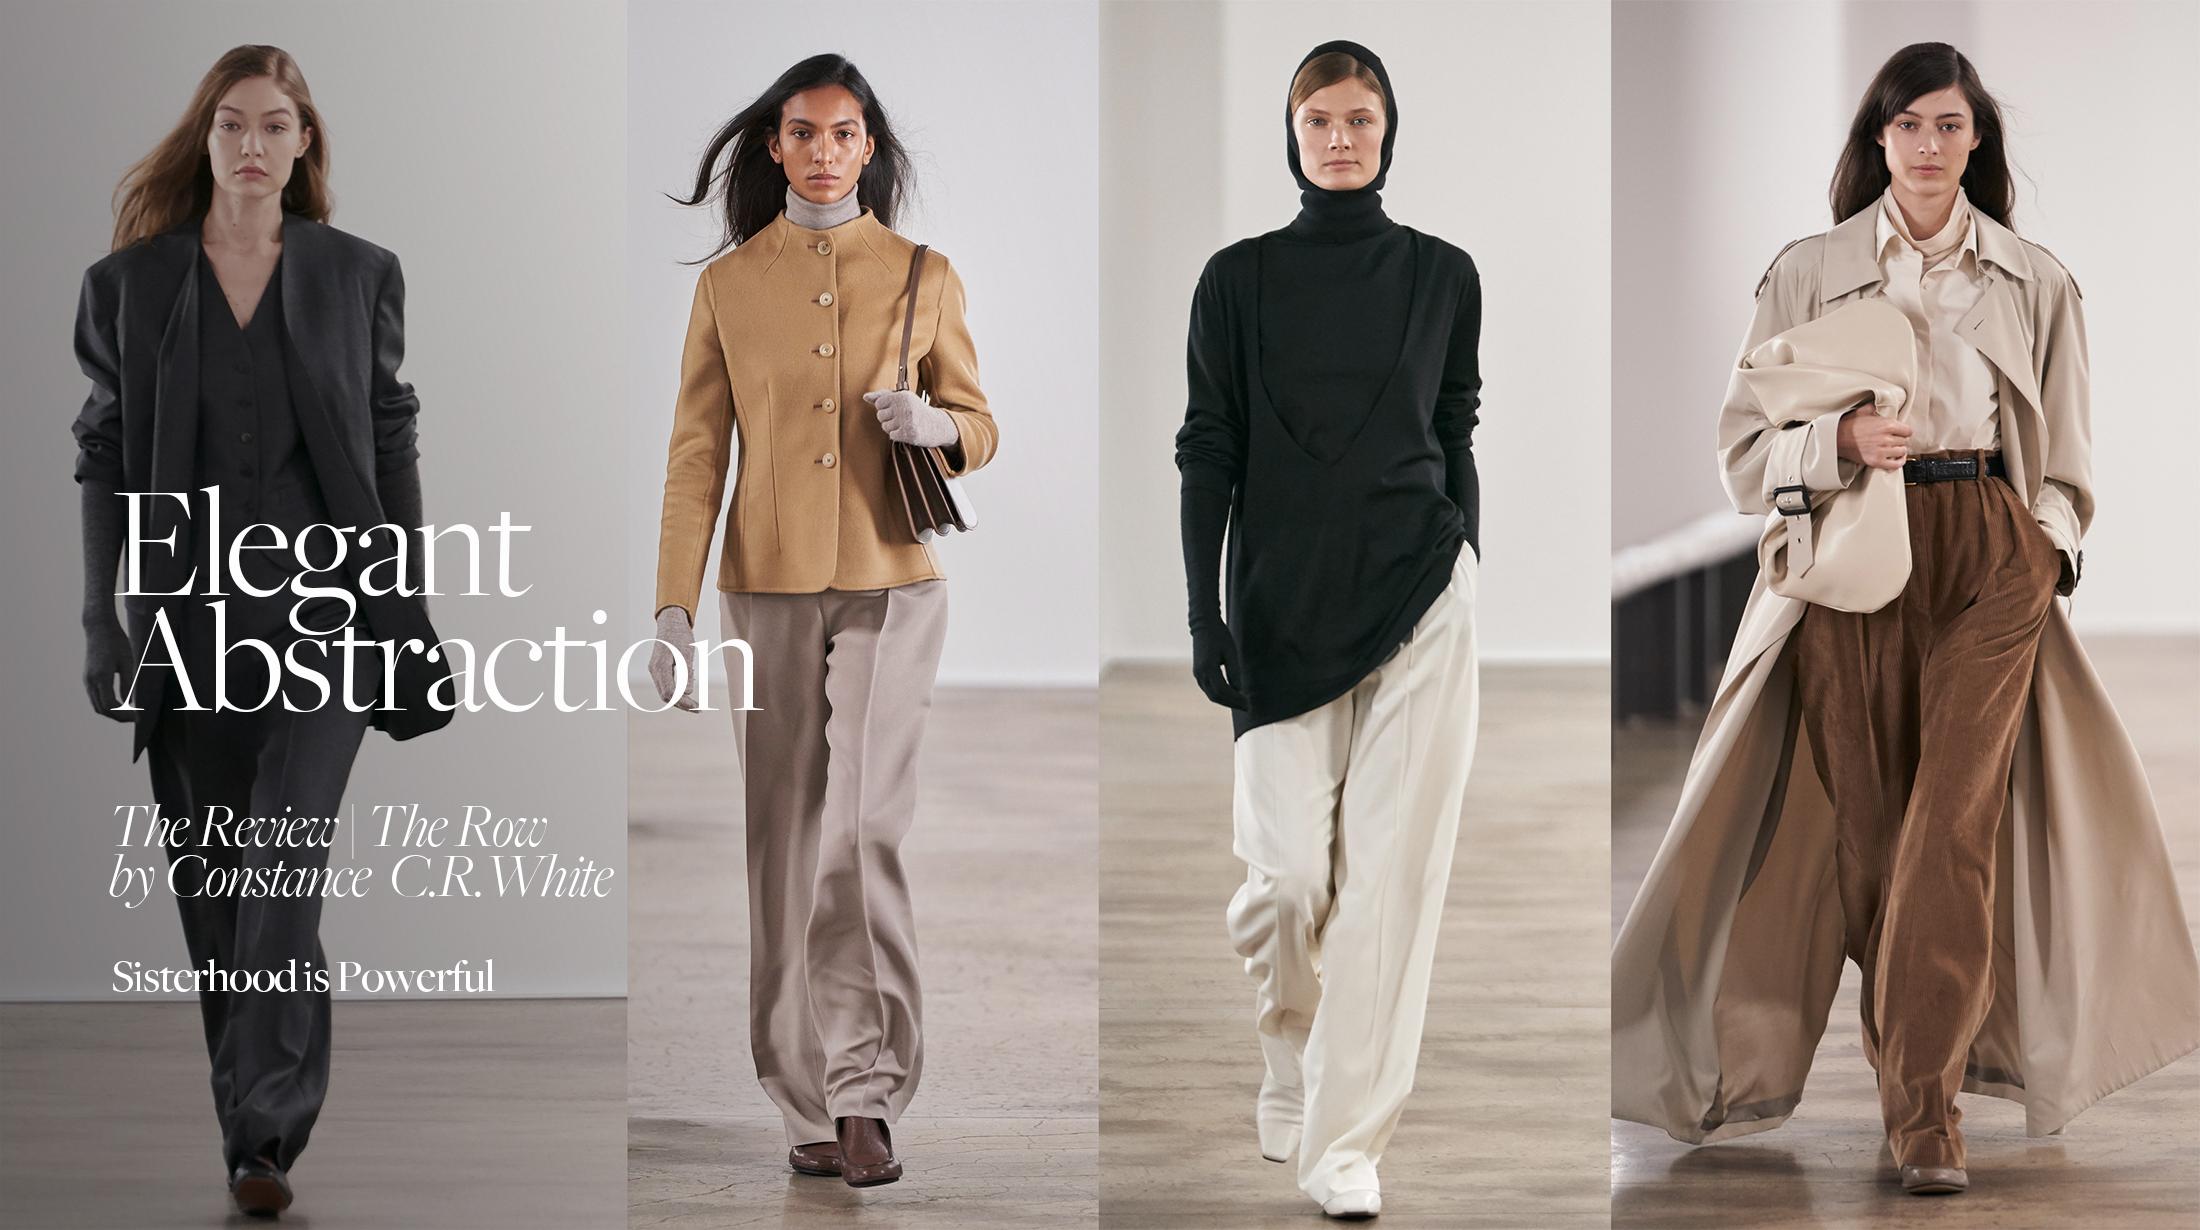 The Impression Where Fashion Gets Creative